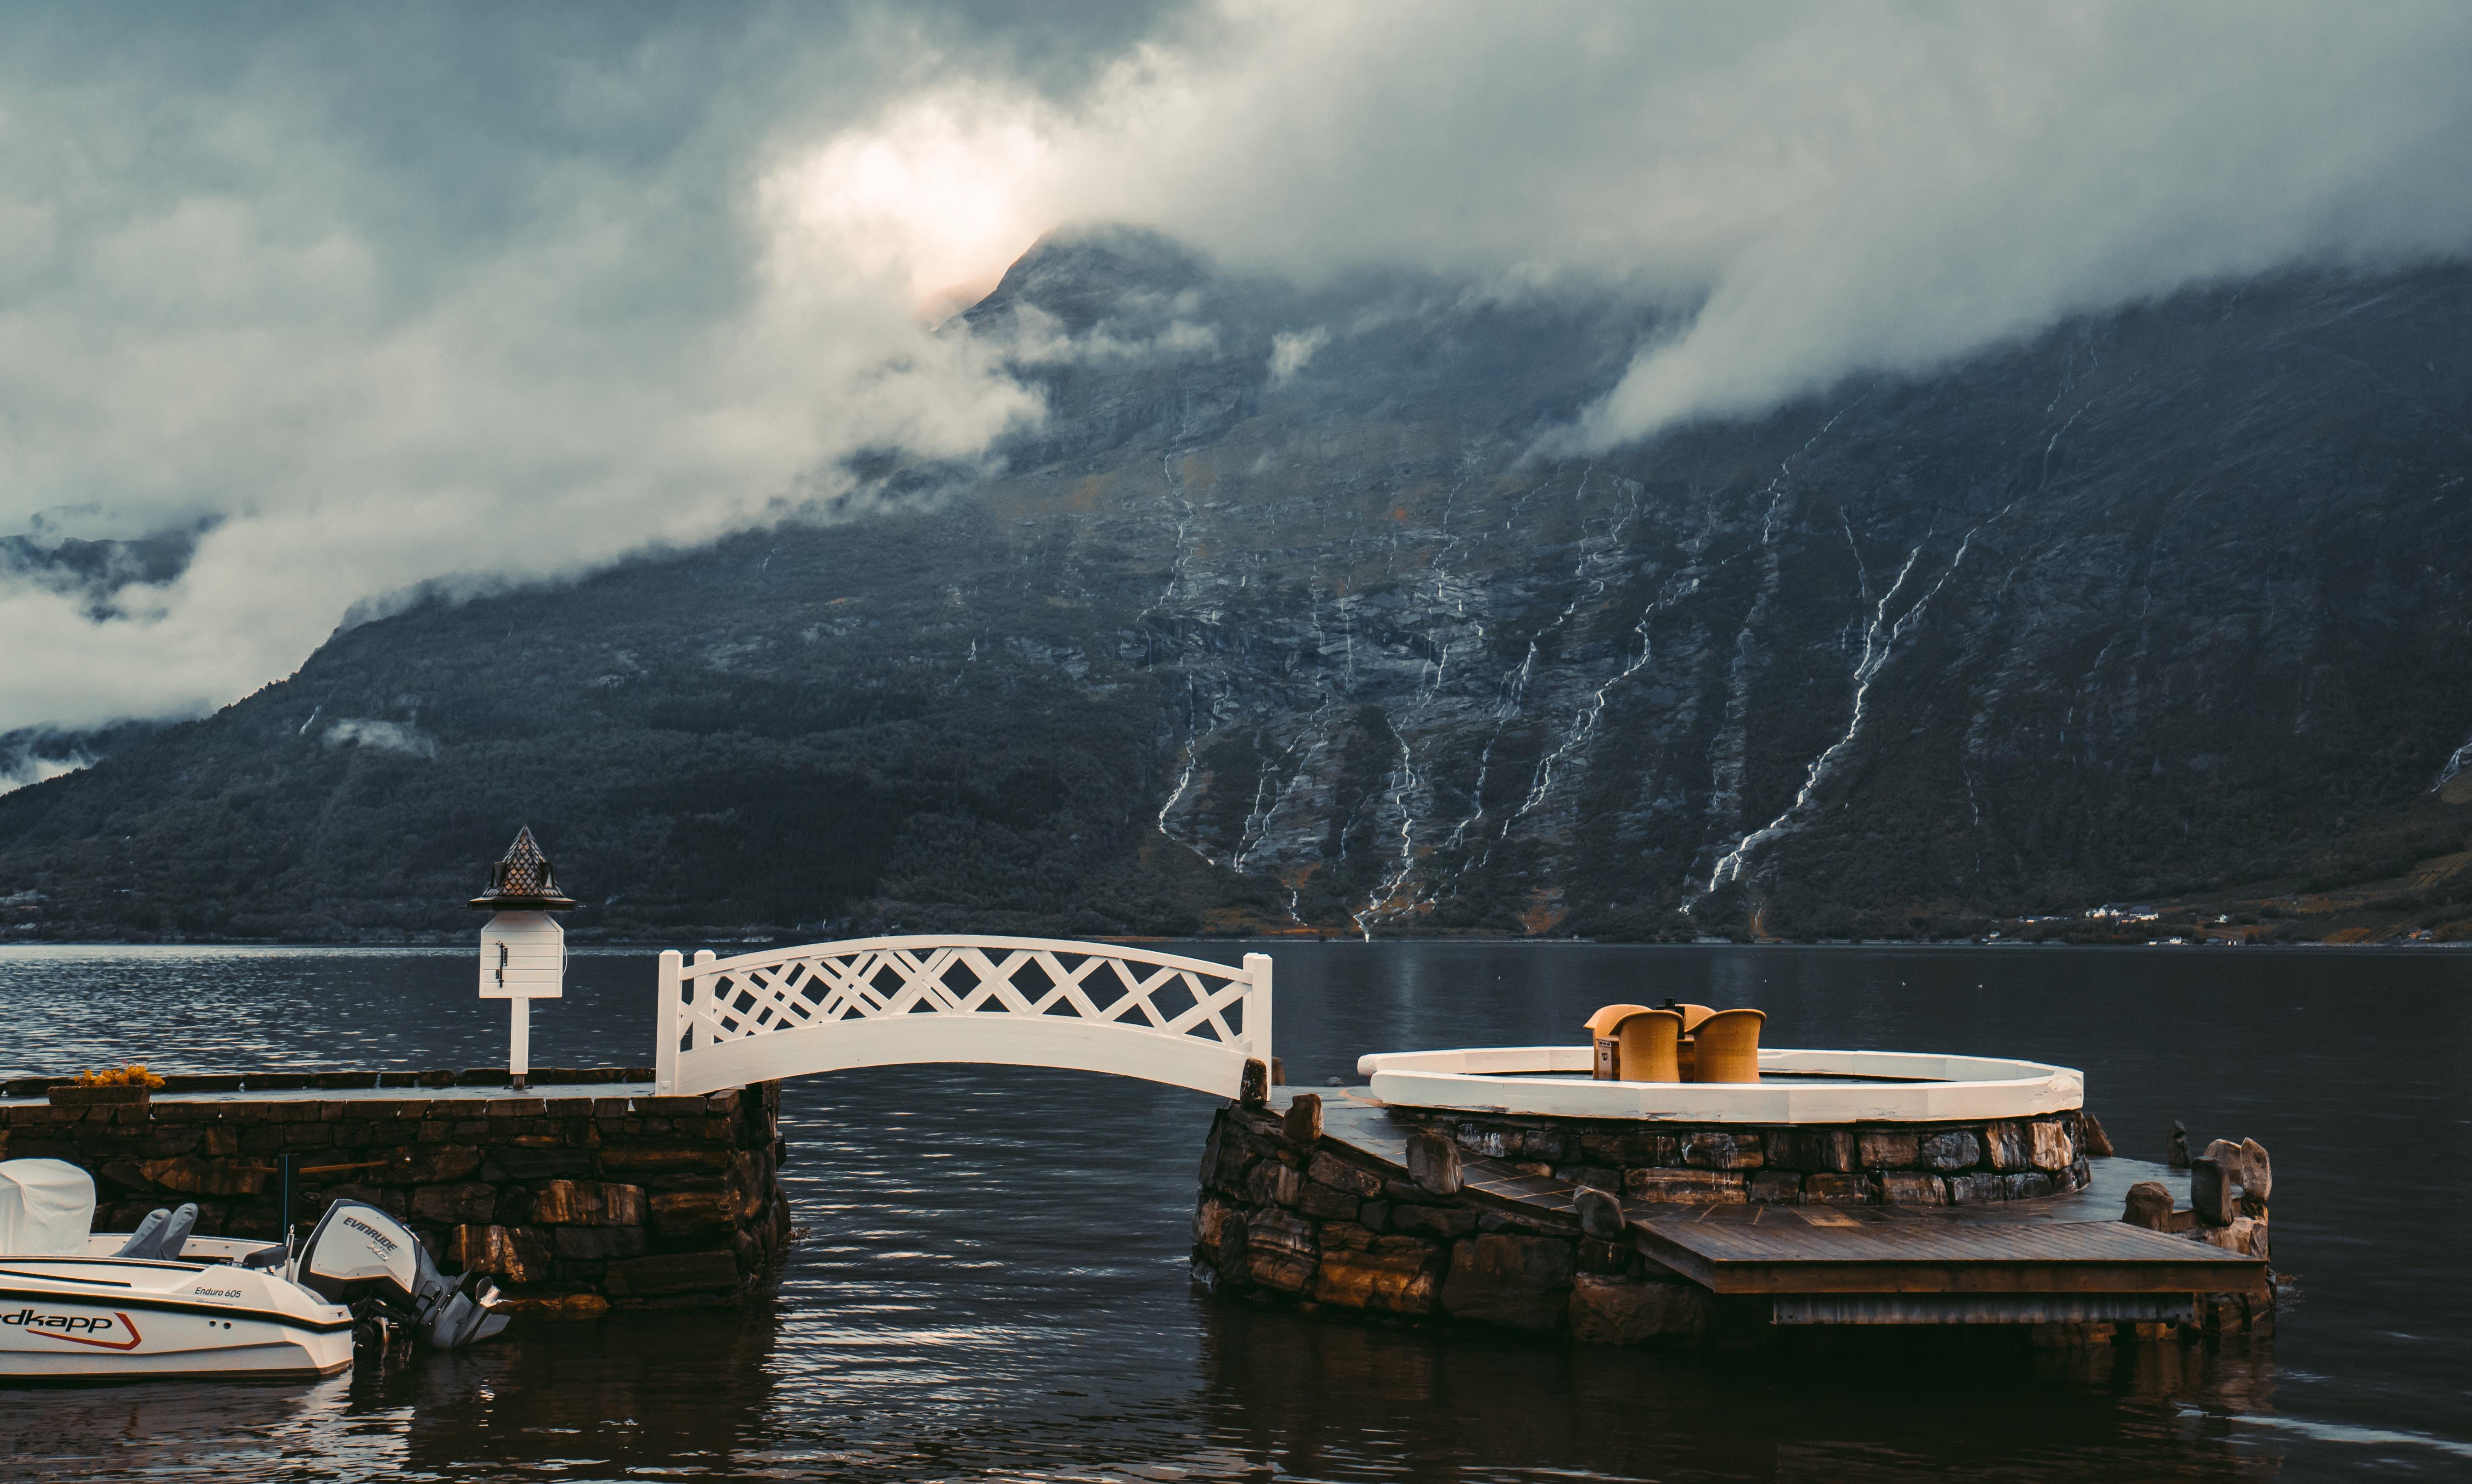 bridge near body of water